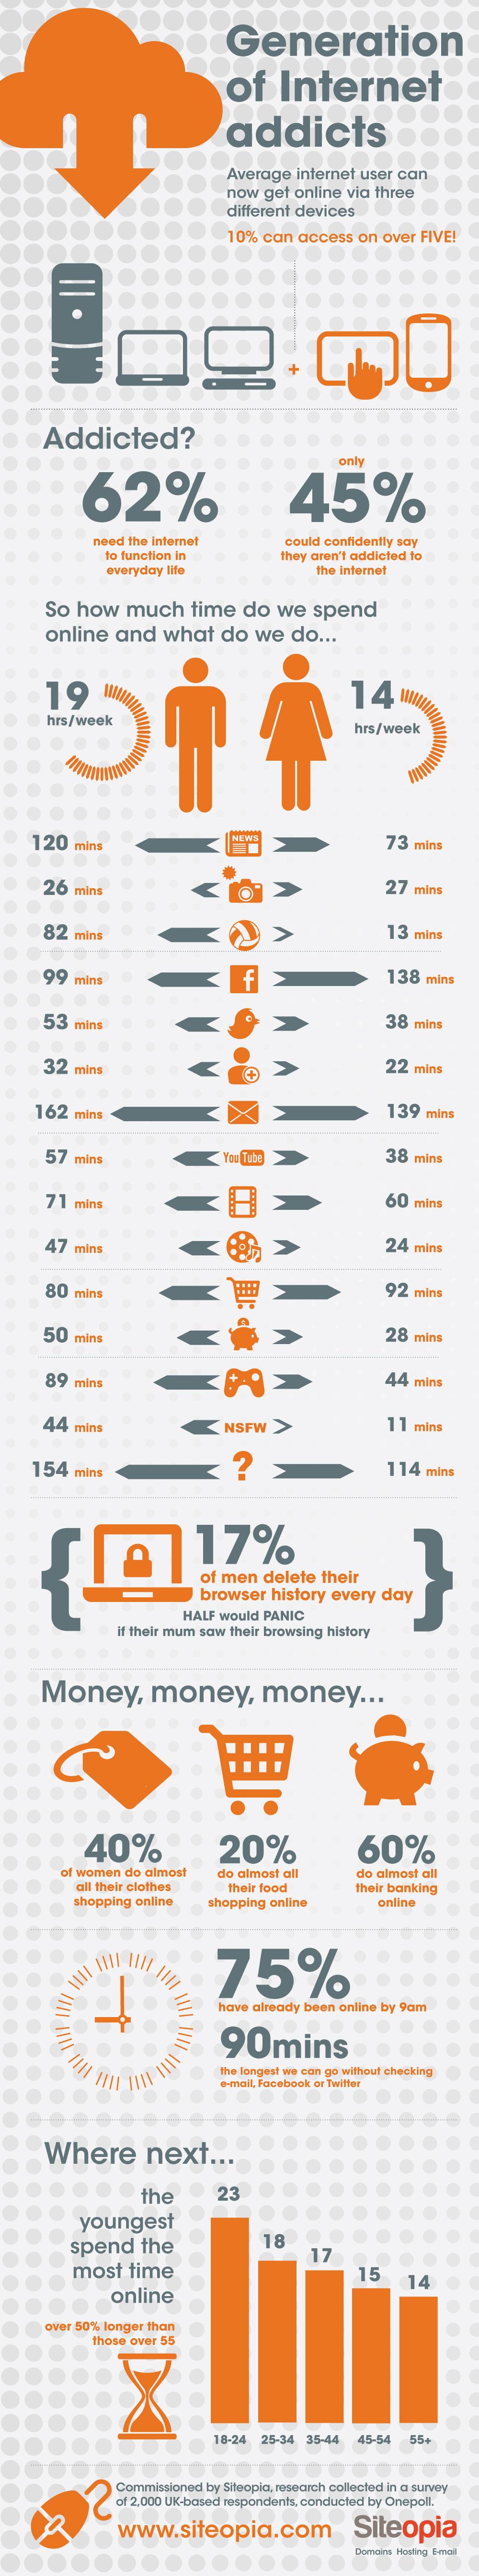 internet-use-the-time-we-spend-and-men-vs-women_50ebebe8edb0d